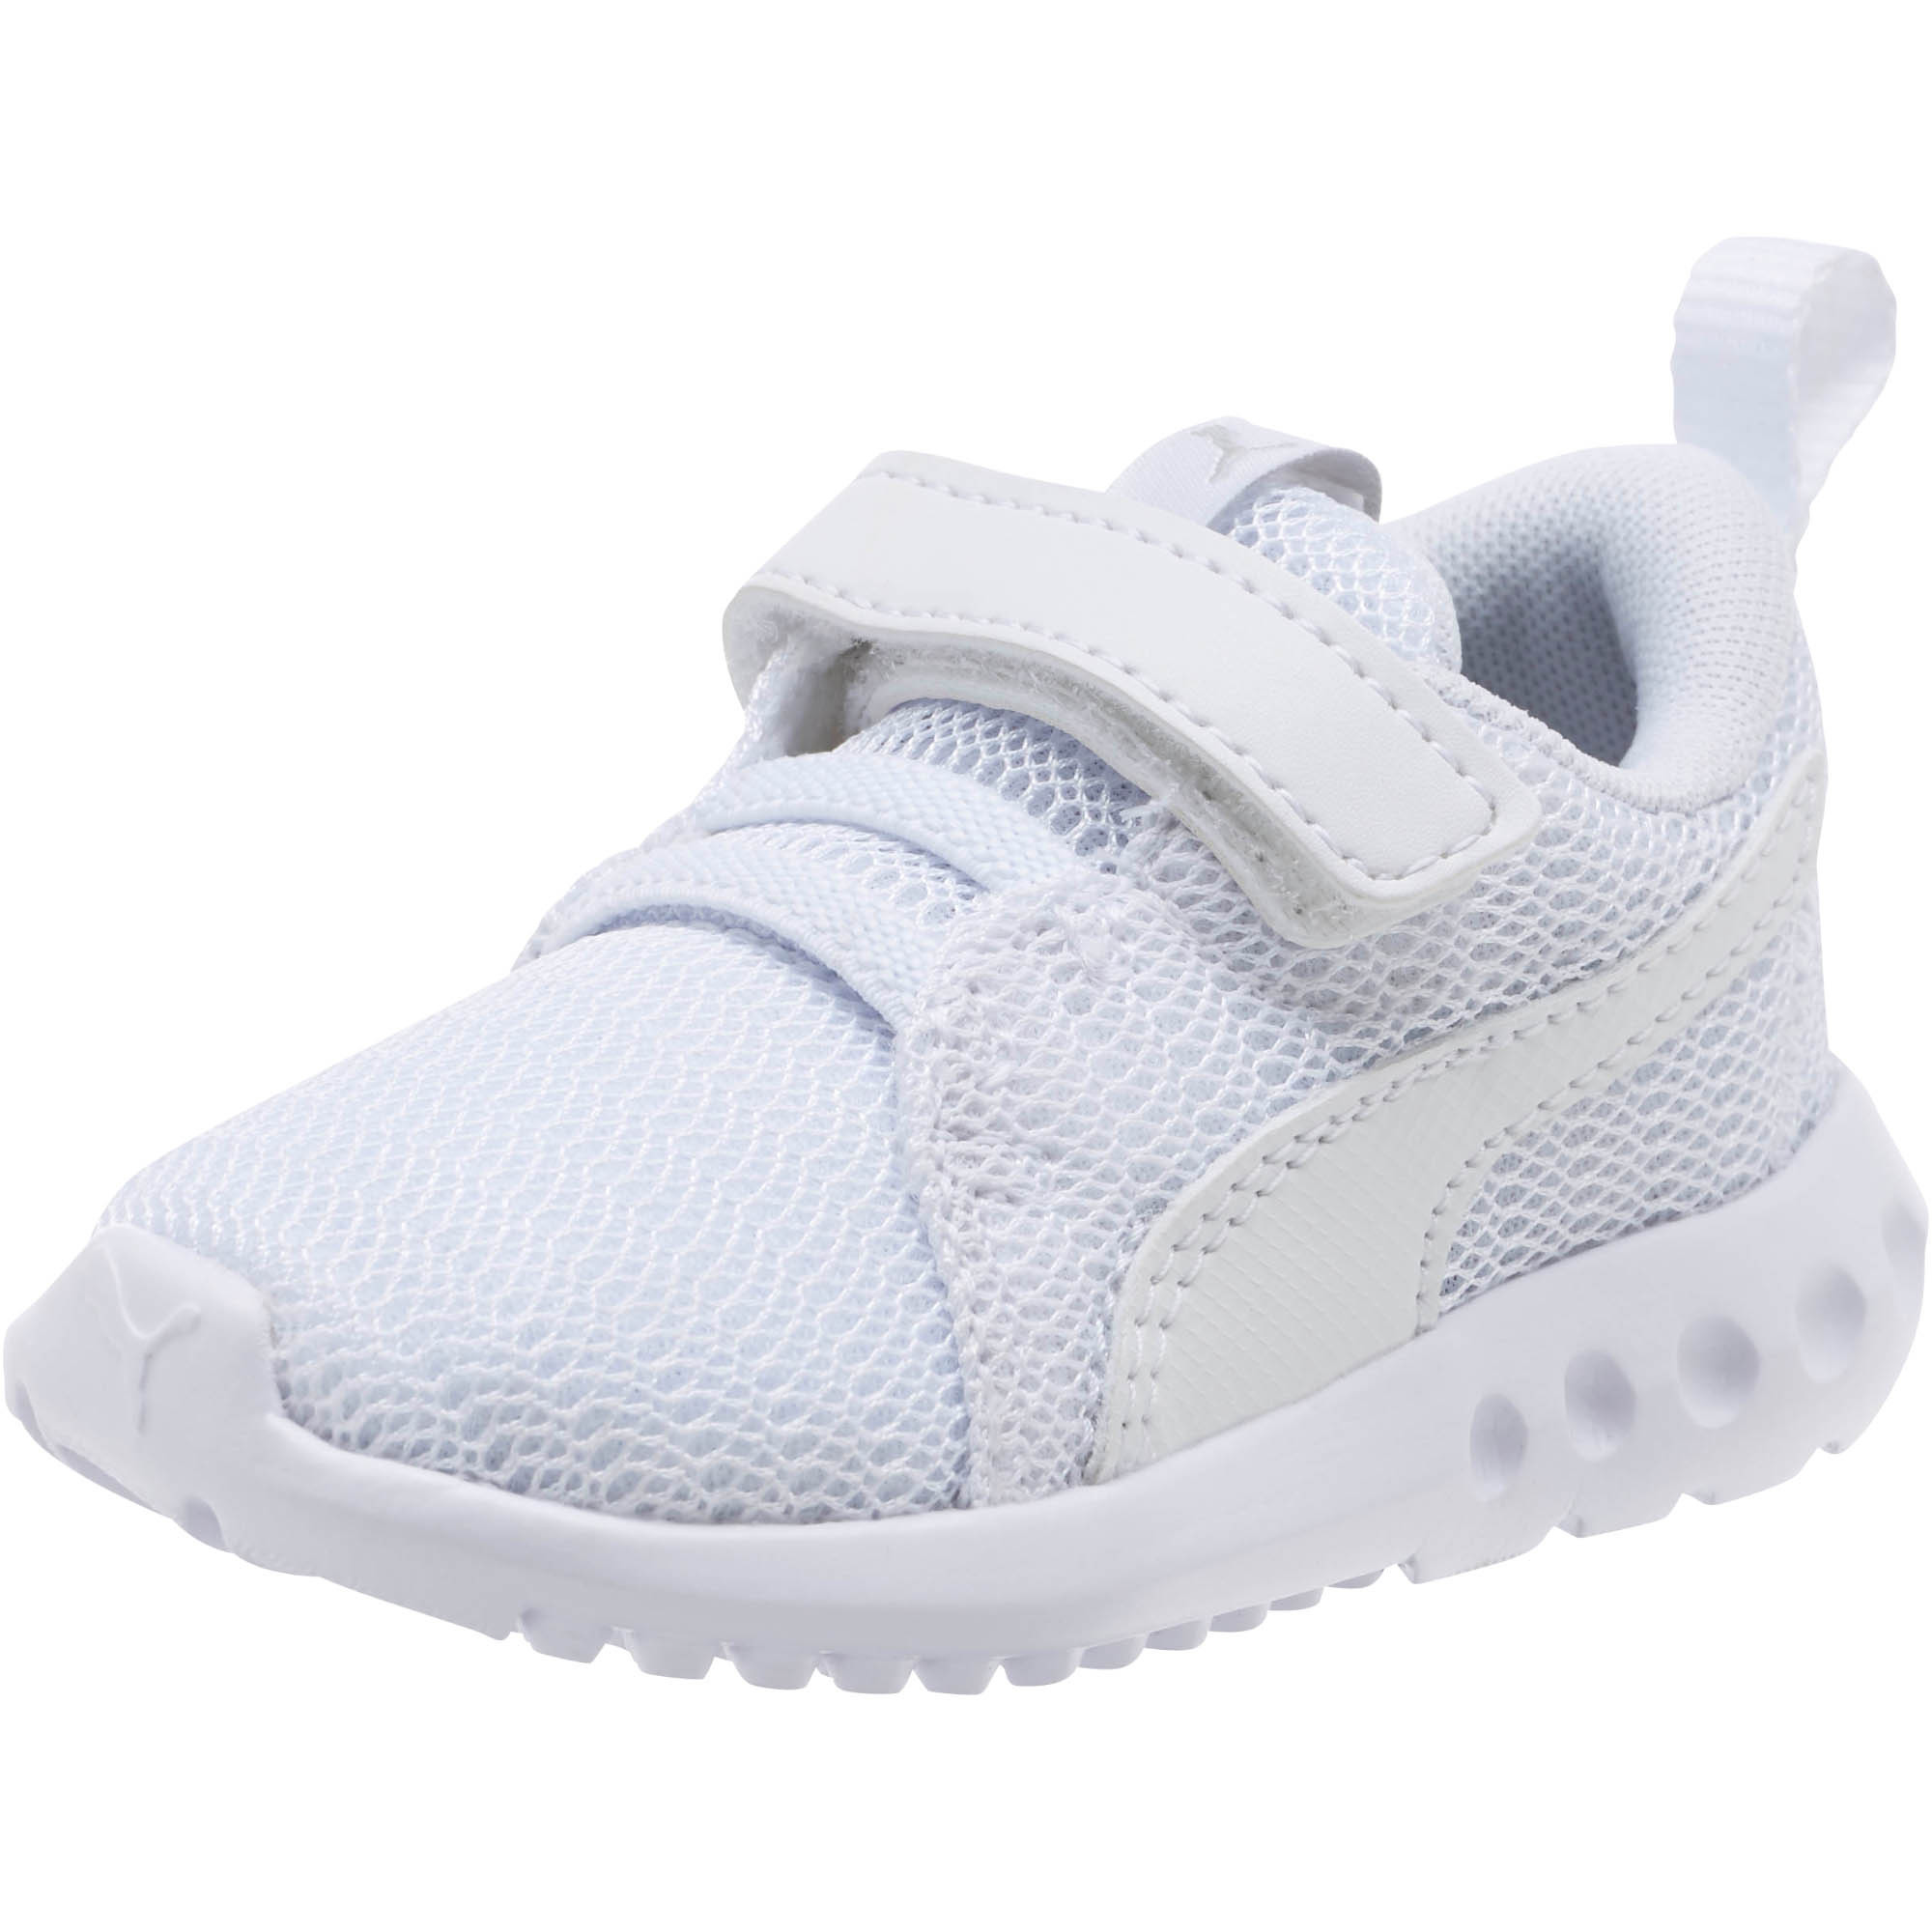 PUMA-Carson-2-Toddler-Shoes-Unisex-Shoe-Kids thumbnail 8